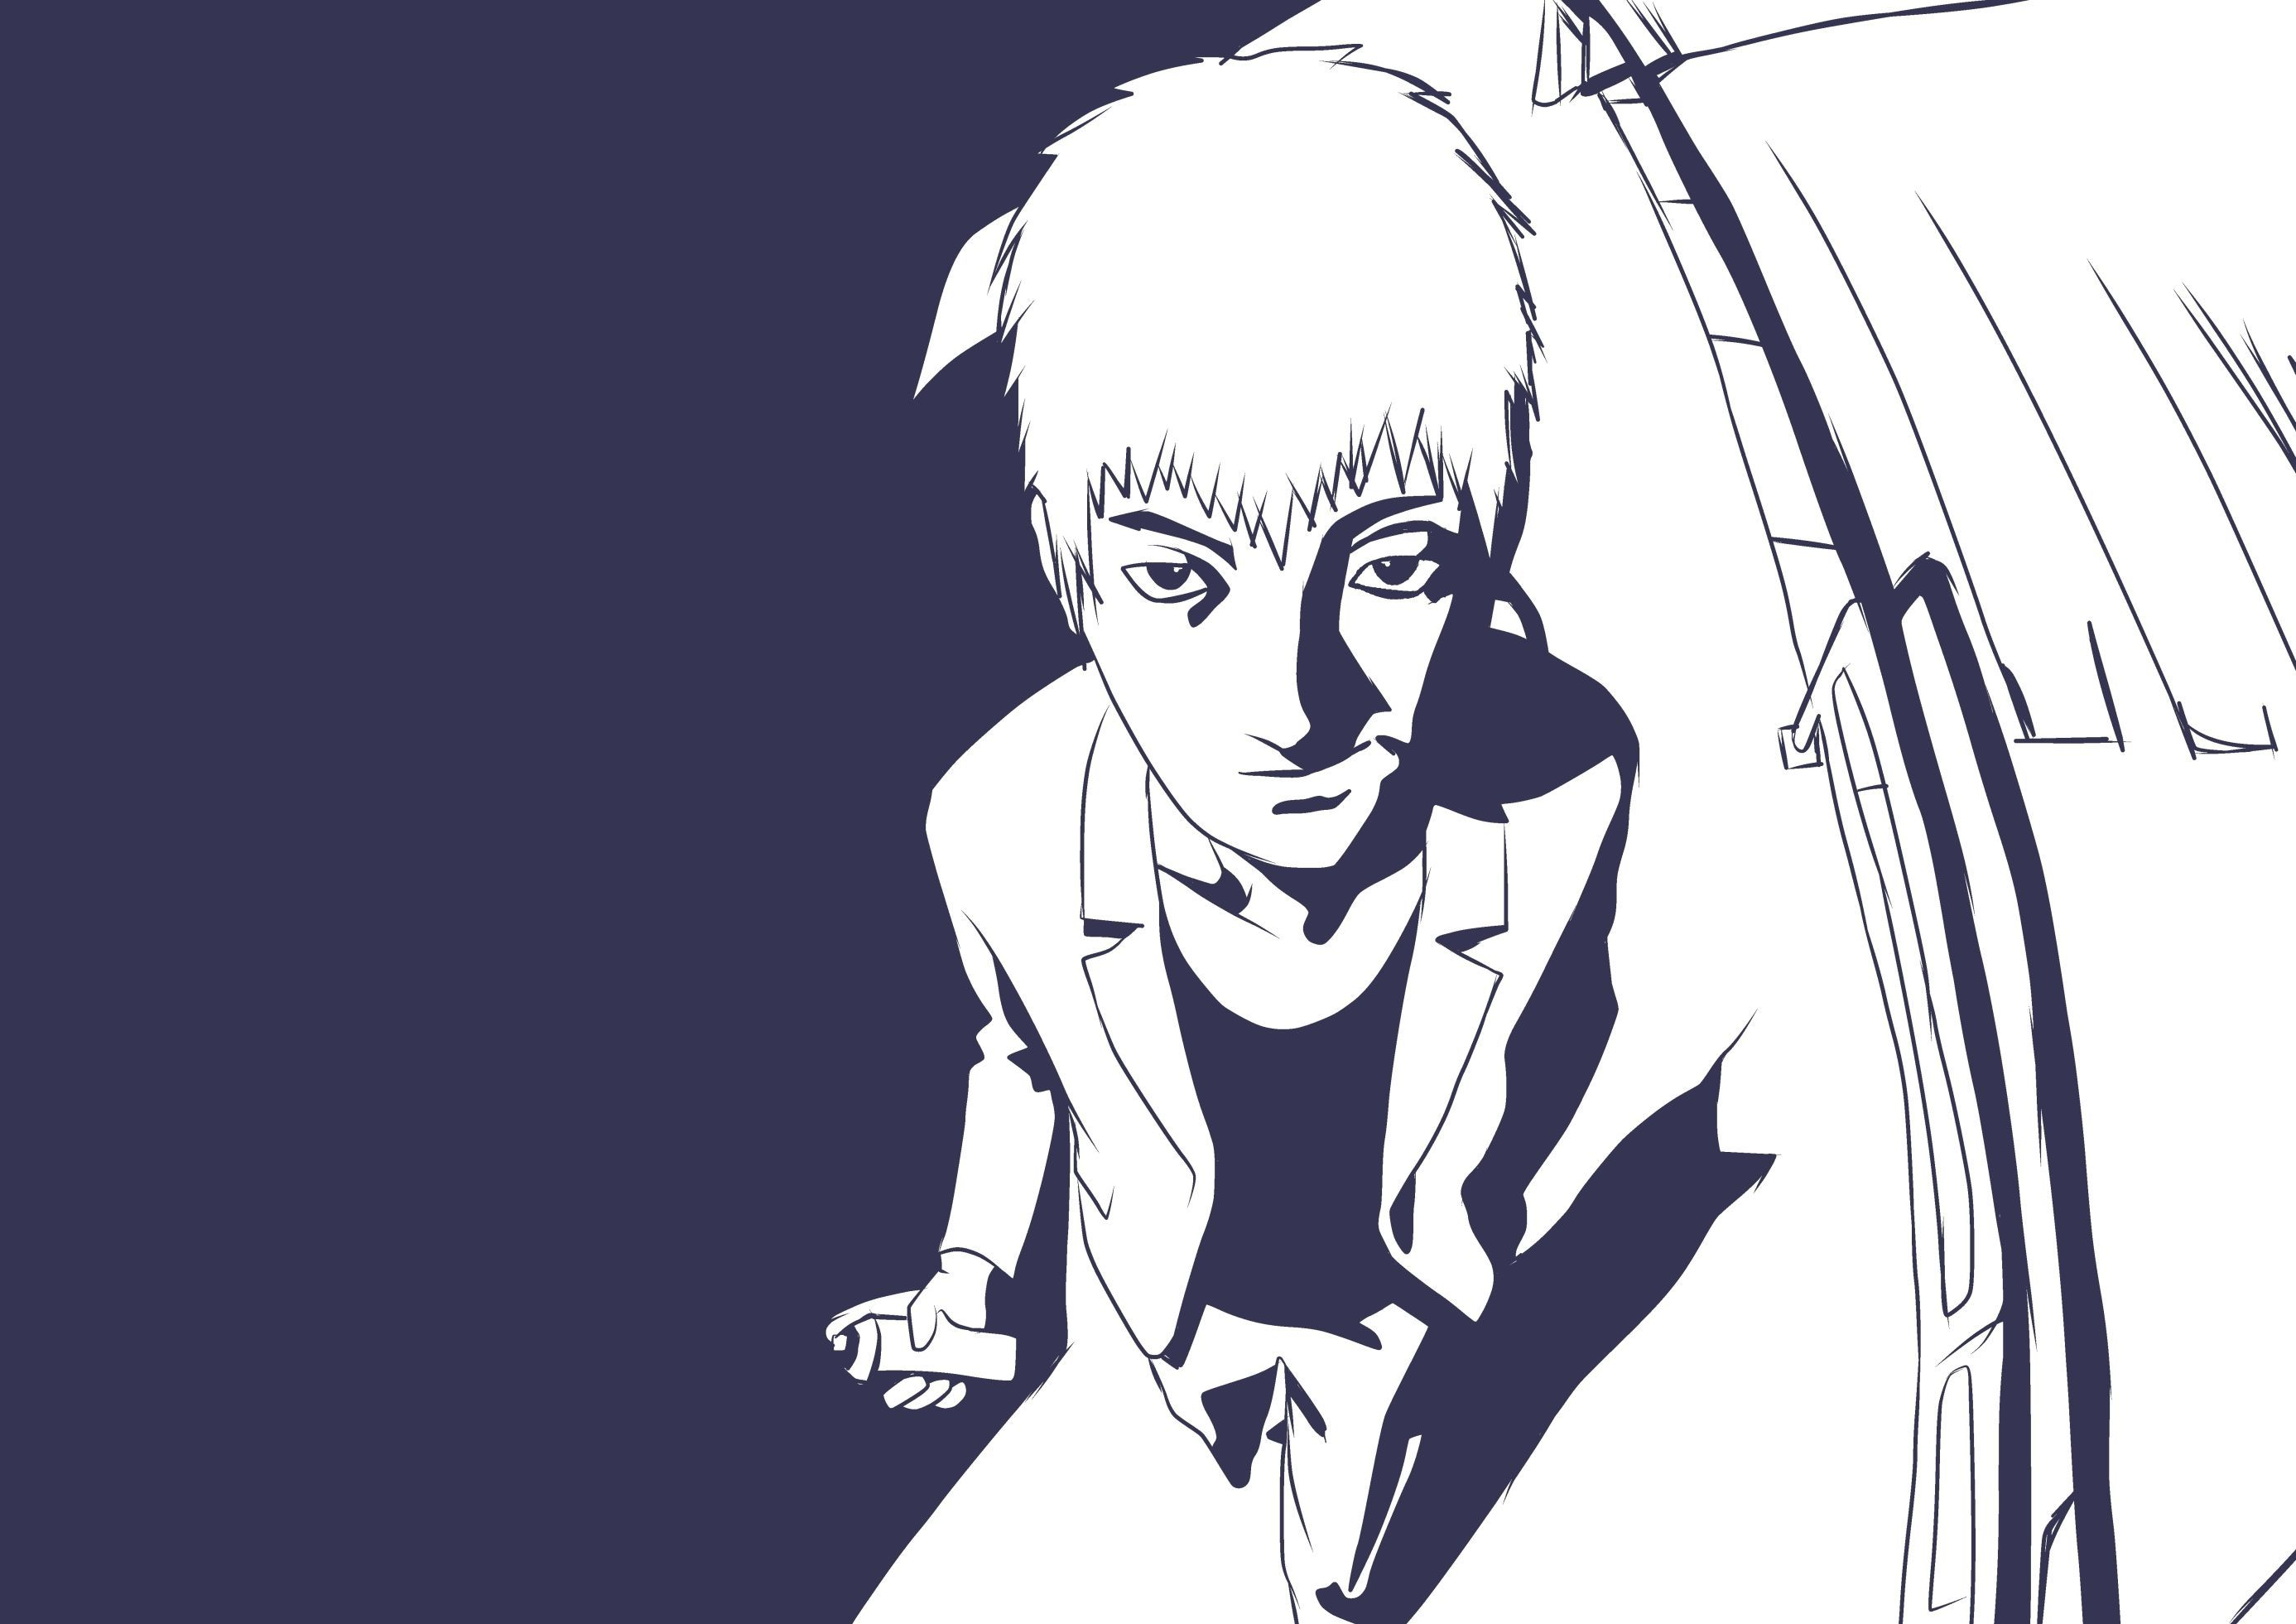 Great Teacher Onizuka By Matthew43 On Deviantart Great Teacher Onizuka Gto Art Cartoonist Anime great teacher onizuka wallpaper